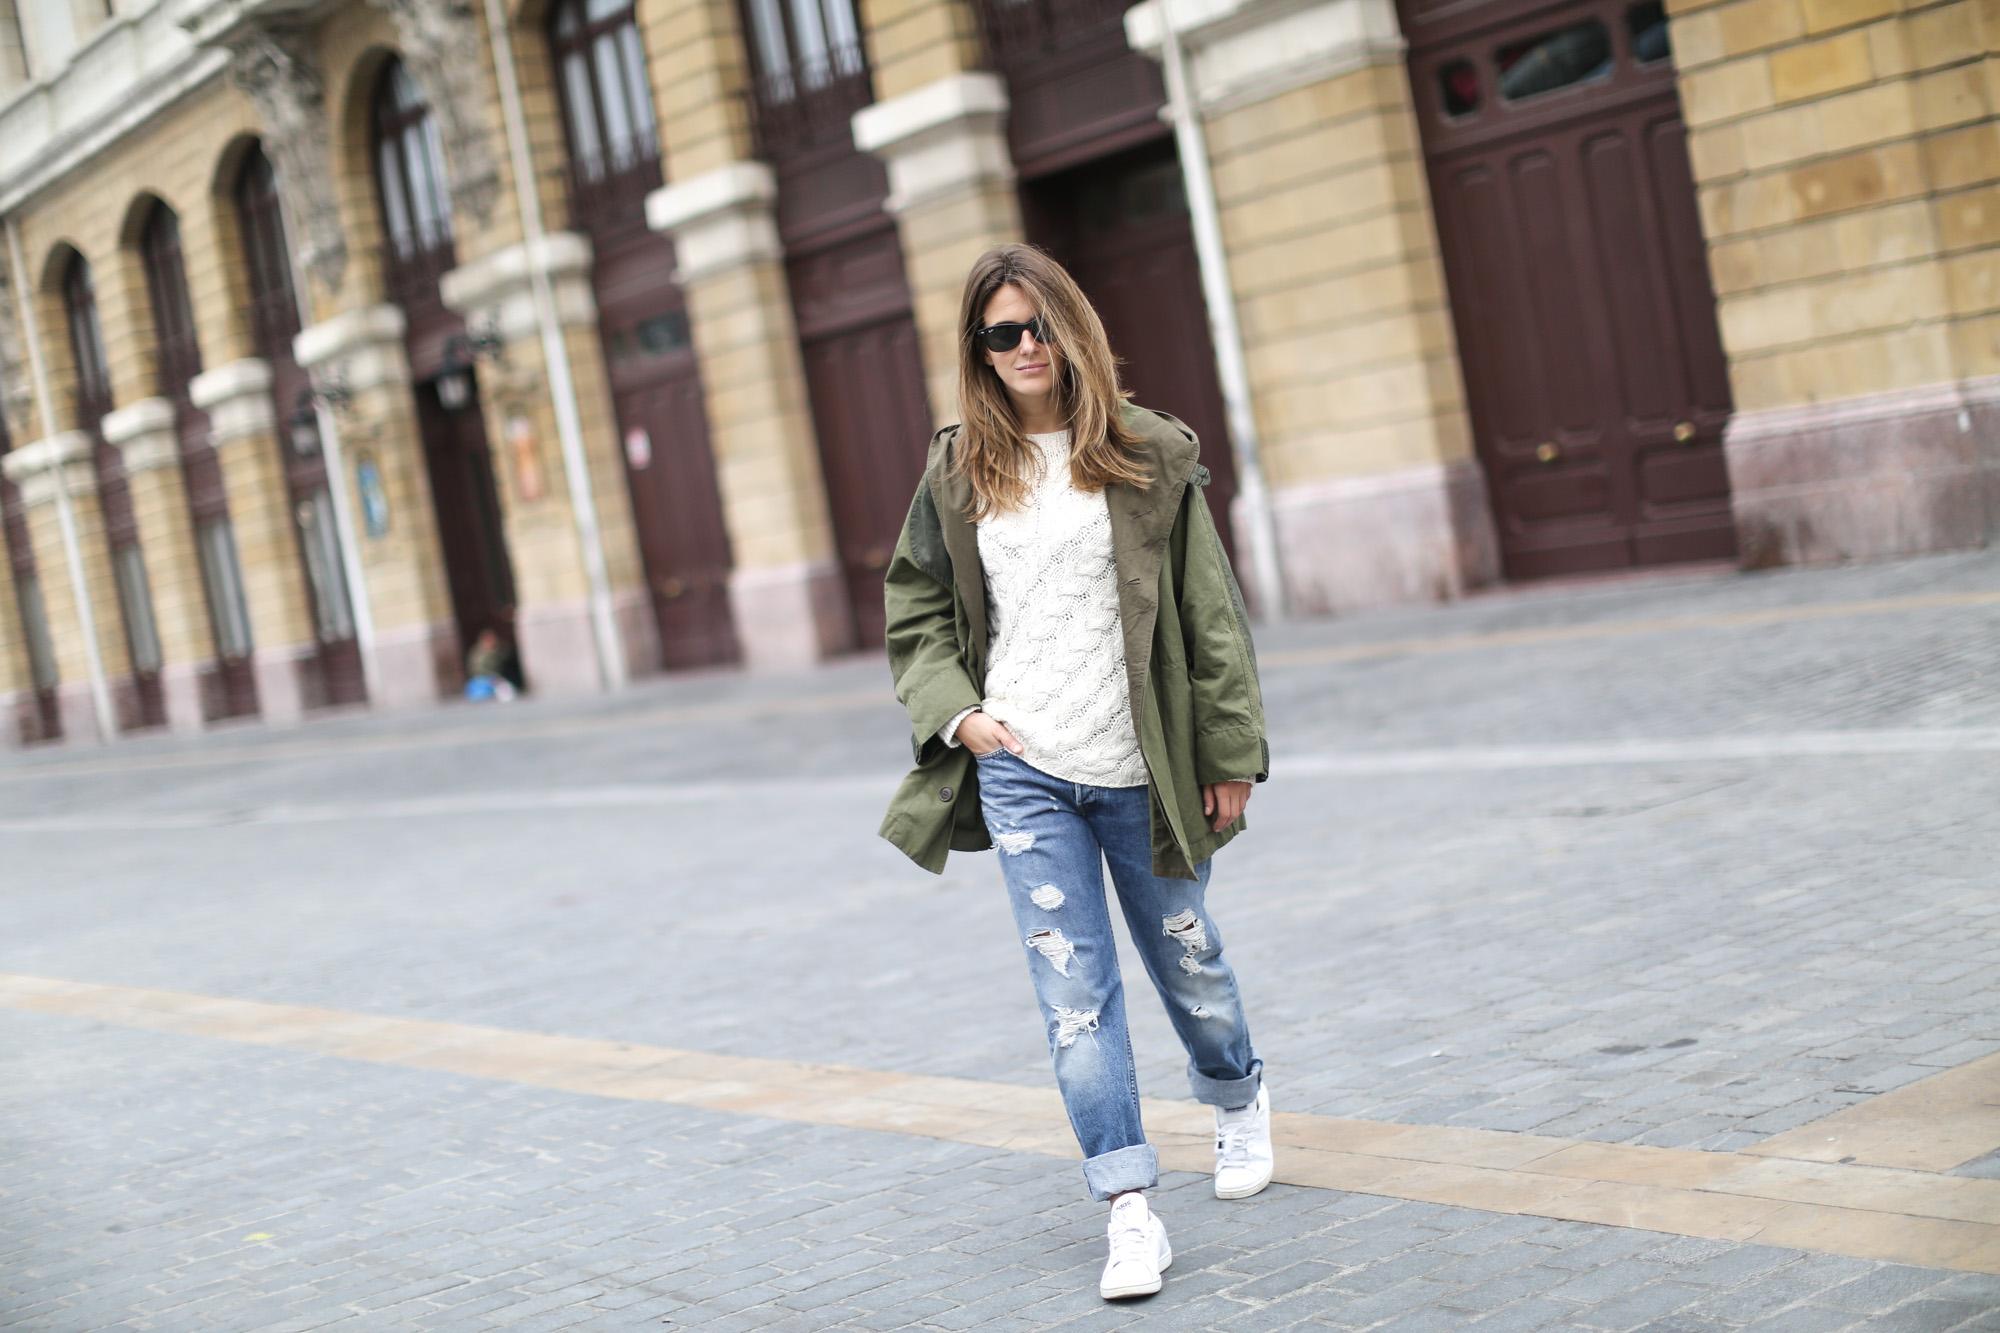 Clochet-streetstyle-isabel-marant-etoile-ellison-parka-acne-studios-jeans-adidas-stan-smith-5